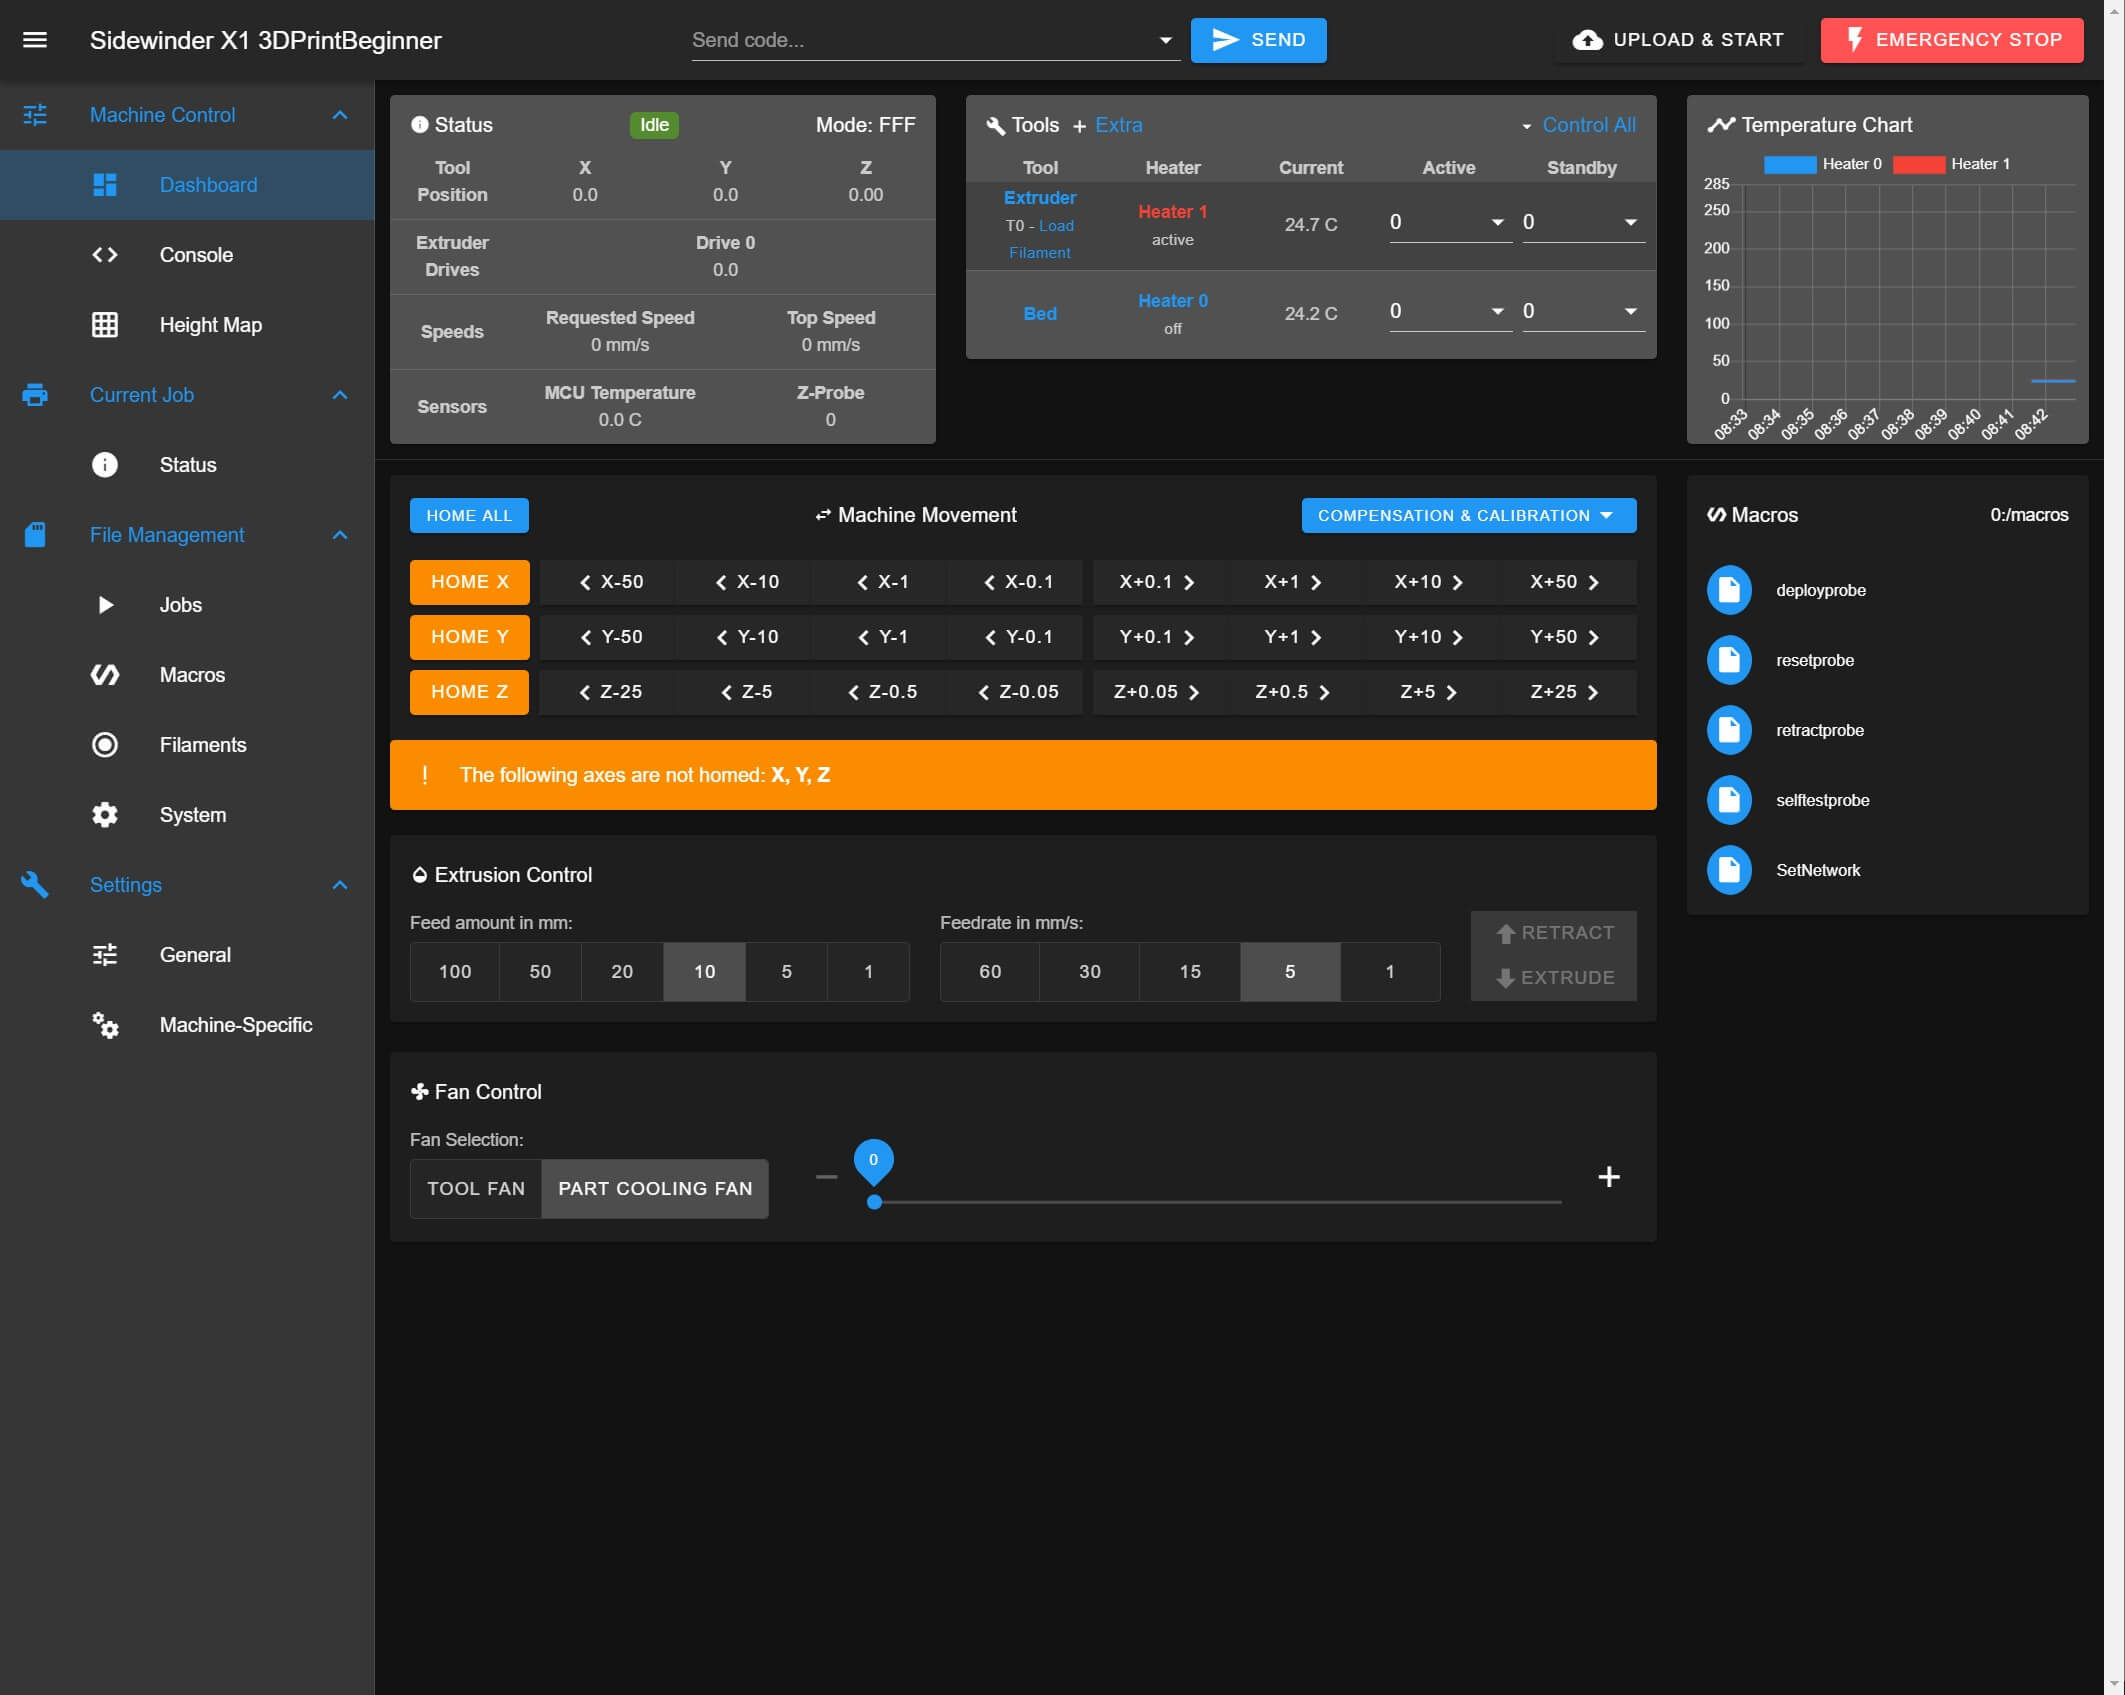 Duet-Web-Control-Sidewinder-X1 RepRap Firmware